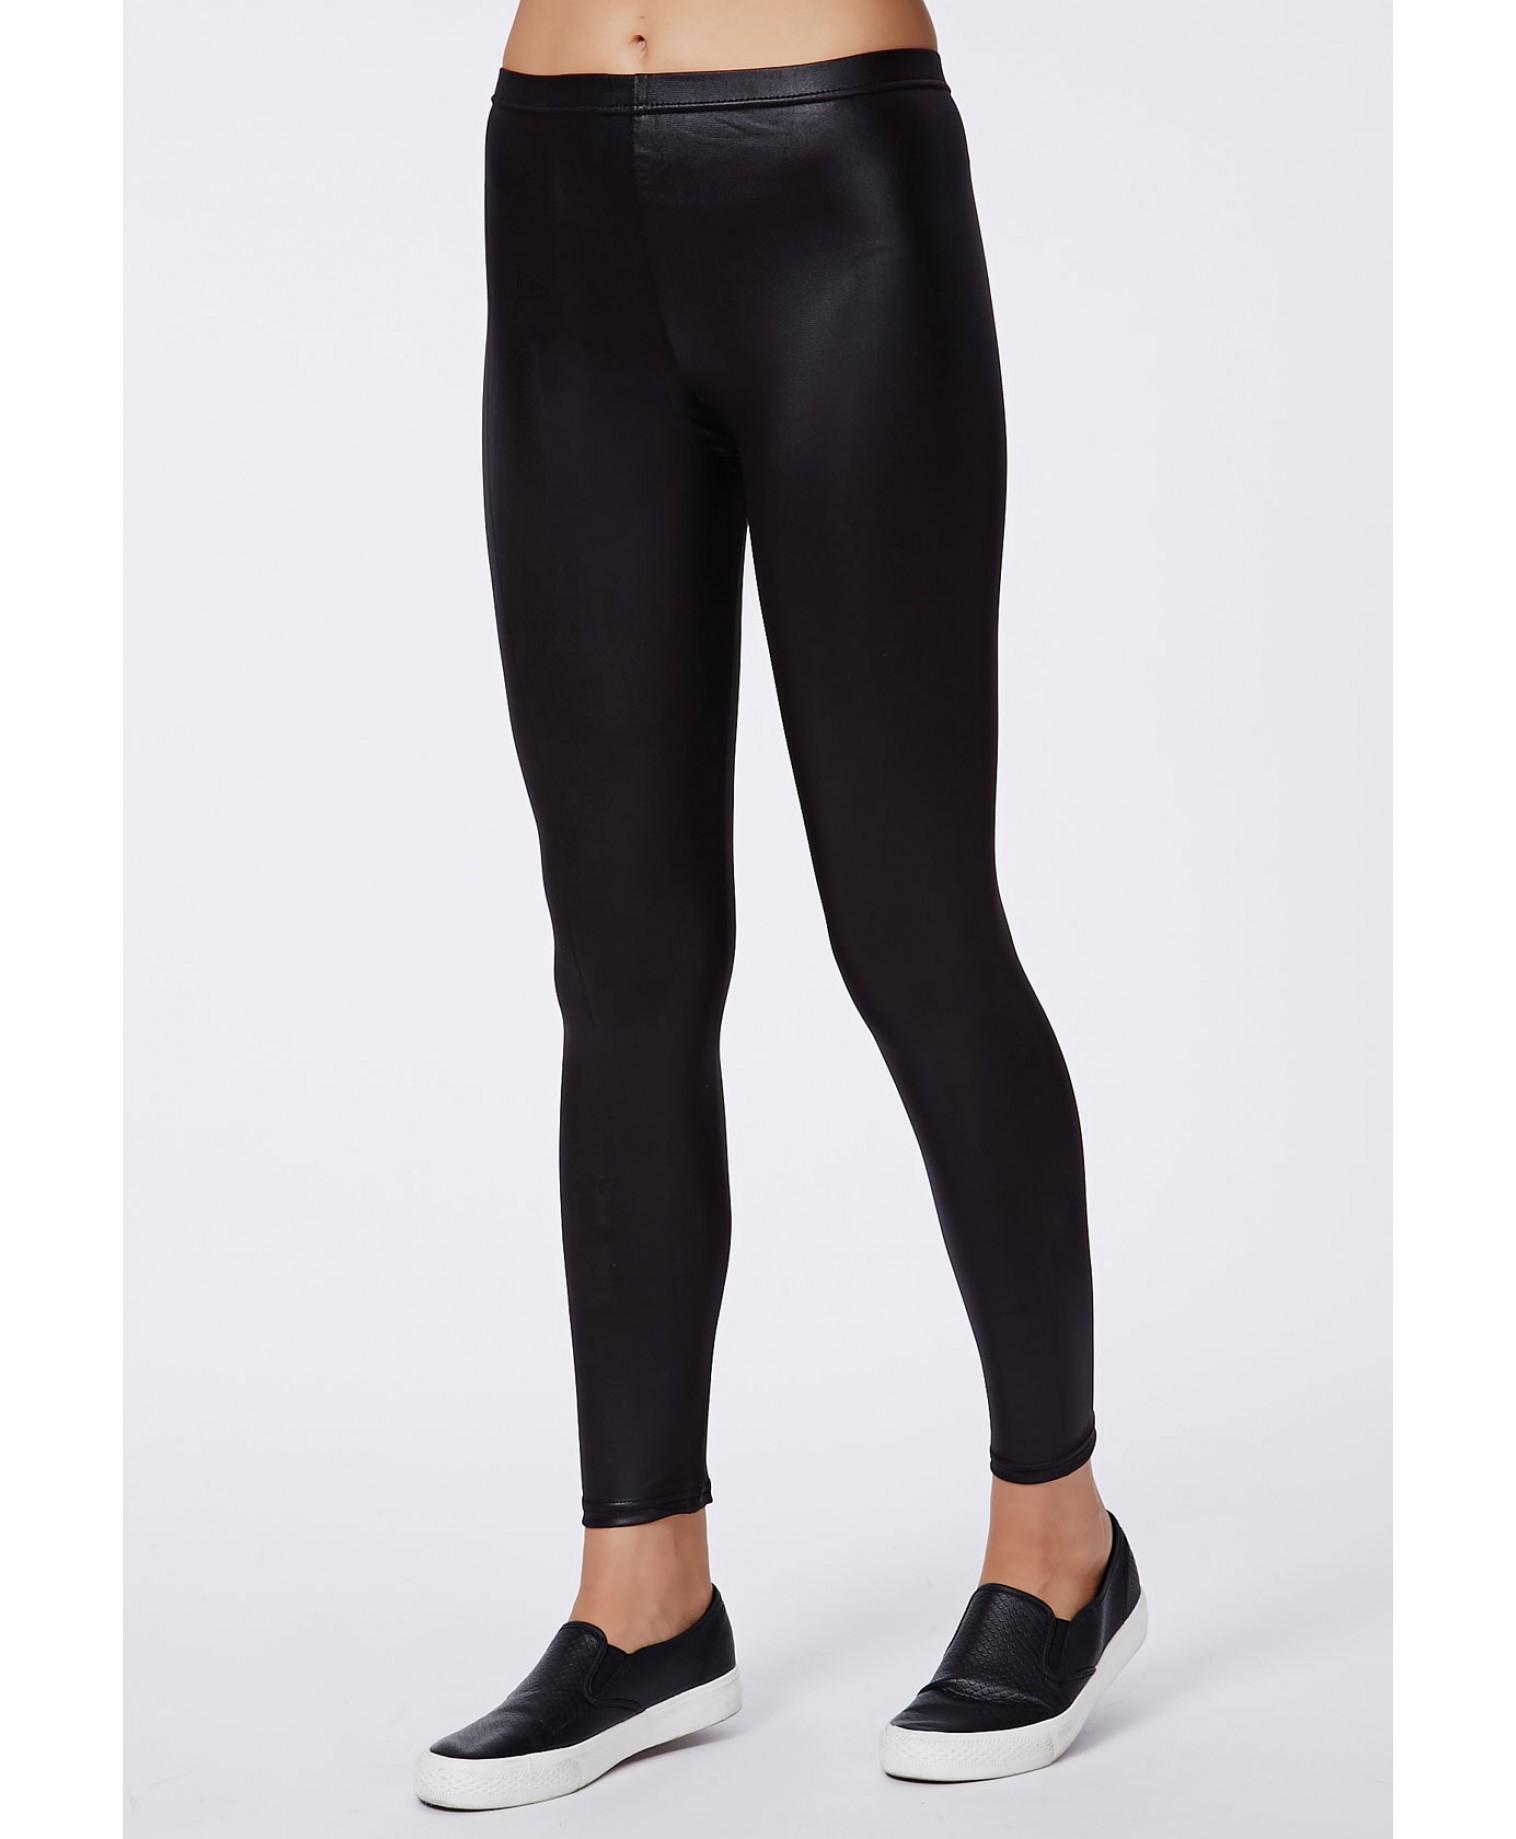 b7ea2efddbb7f1 Lyst - Missguided Clarre Wet Look Leggings in Black